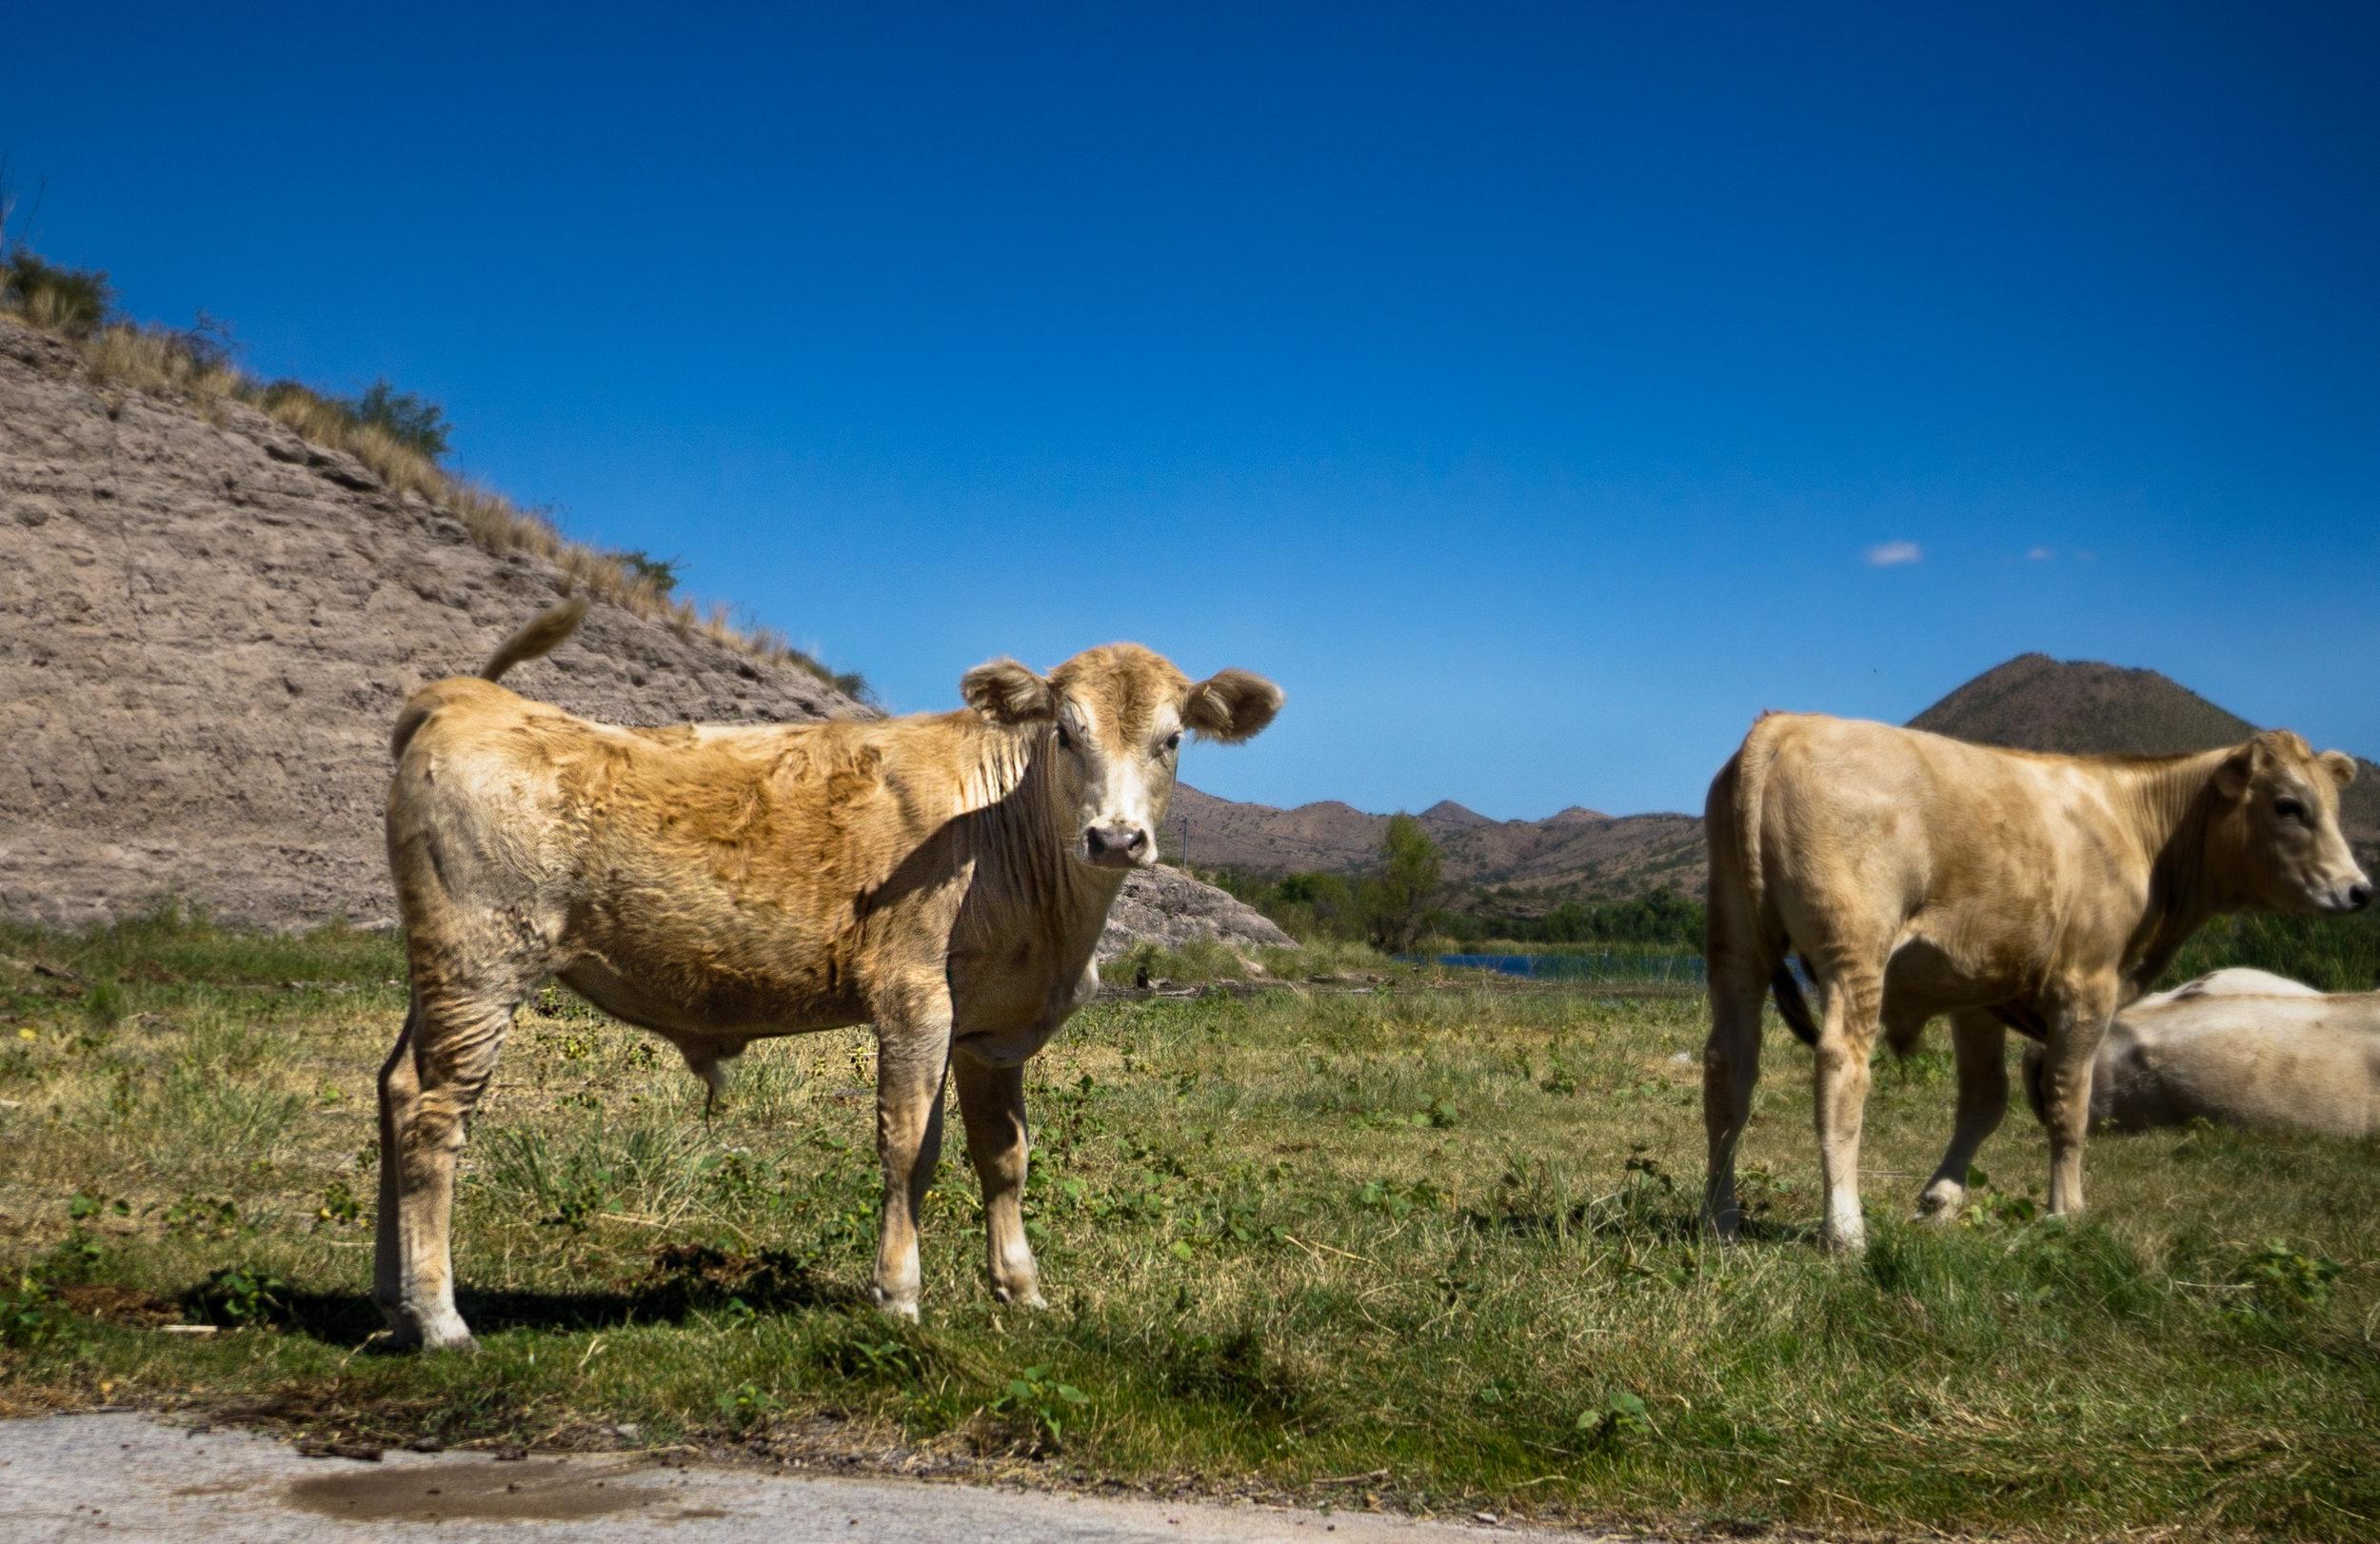 vickygood_photography_nature_arizona_cattle.jpg